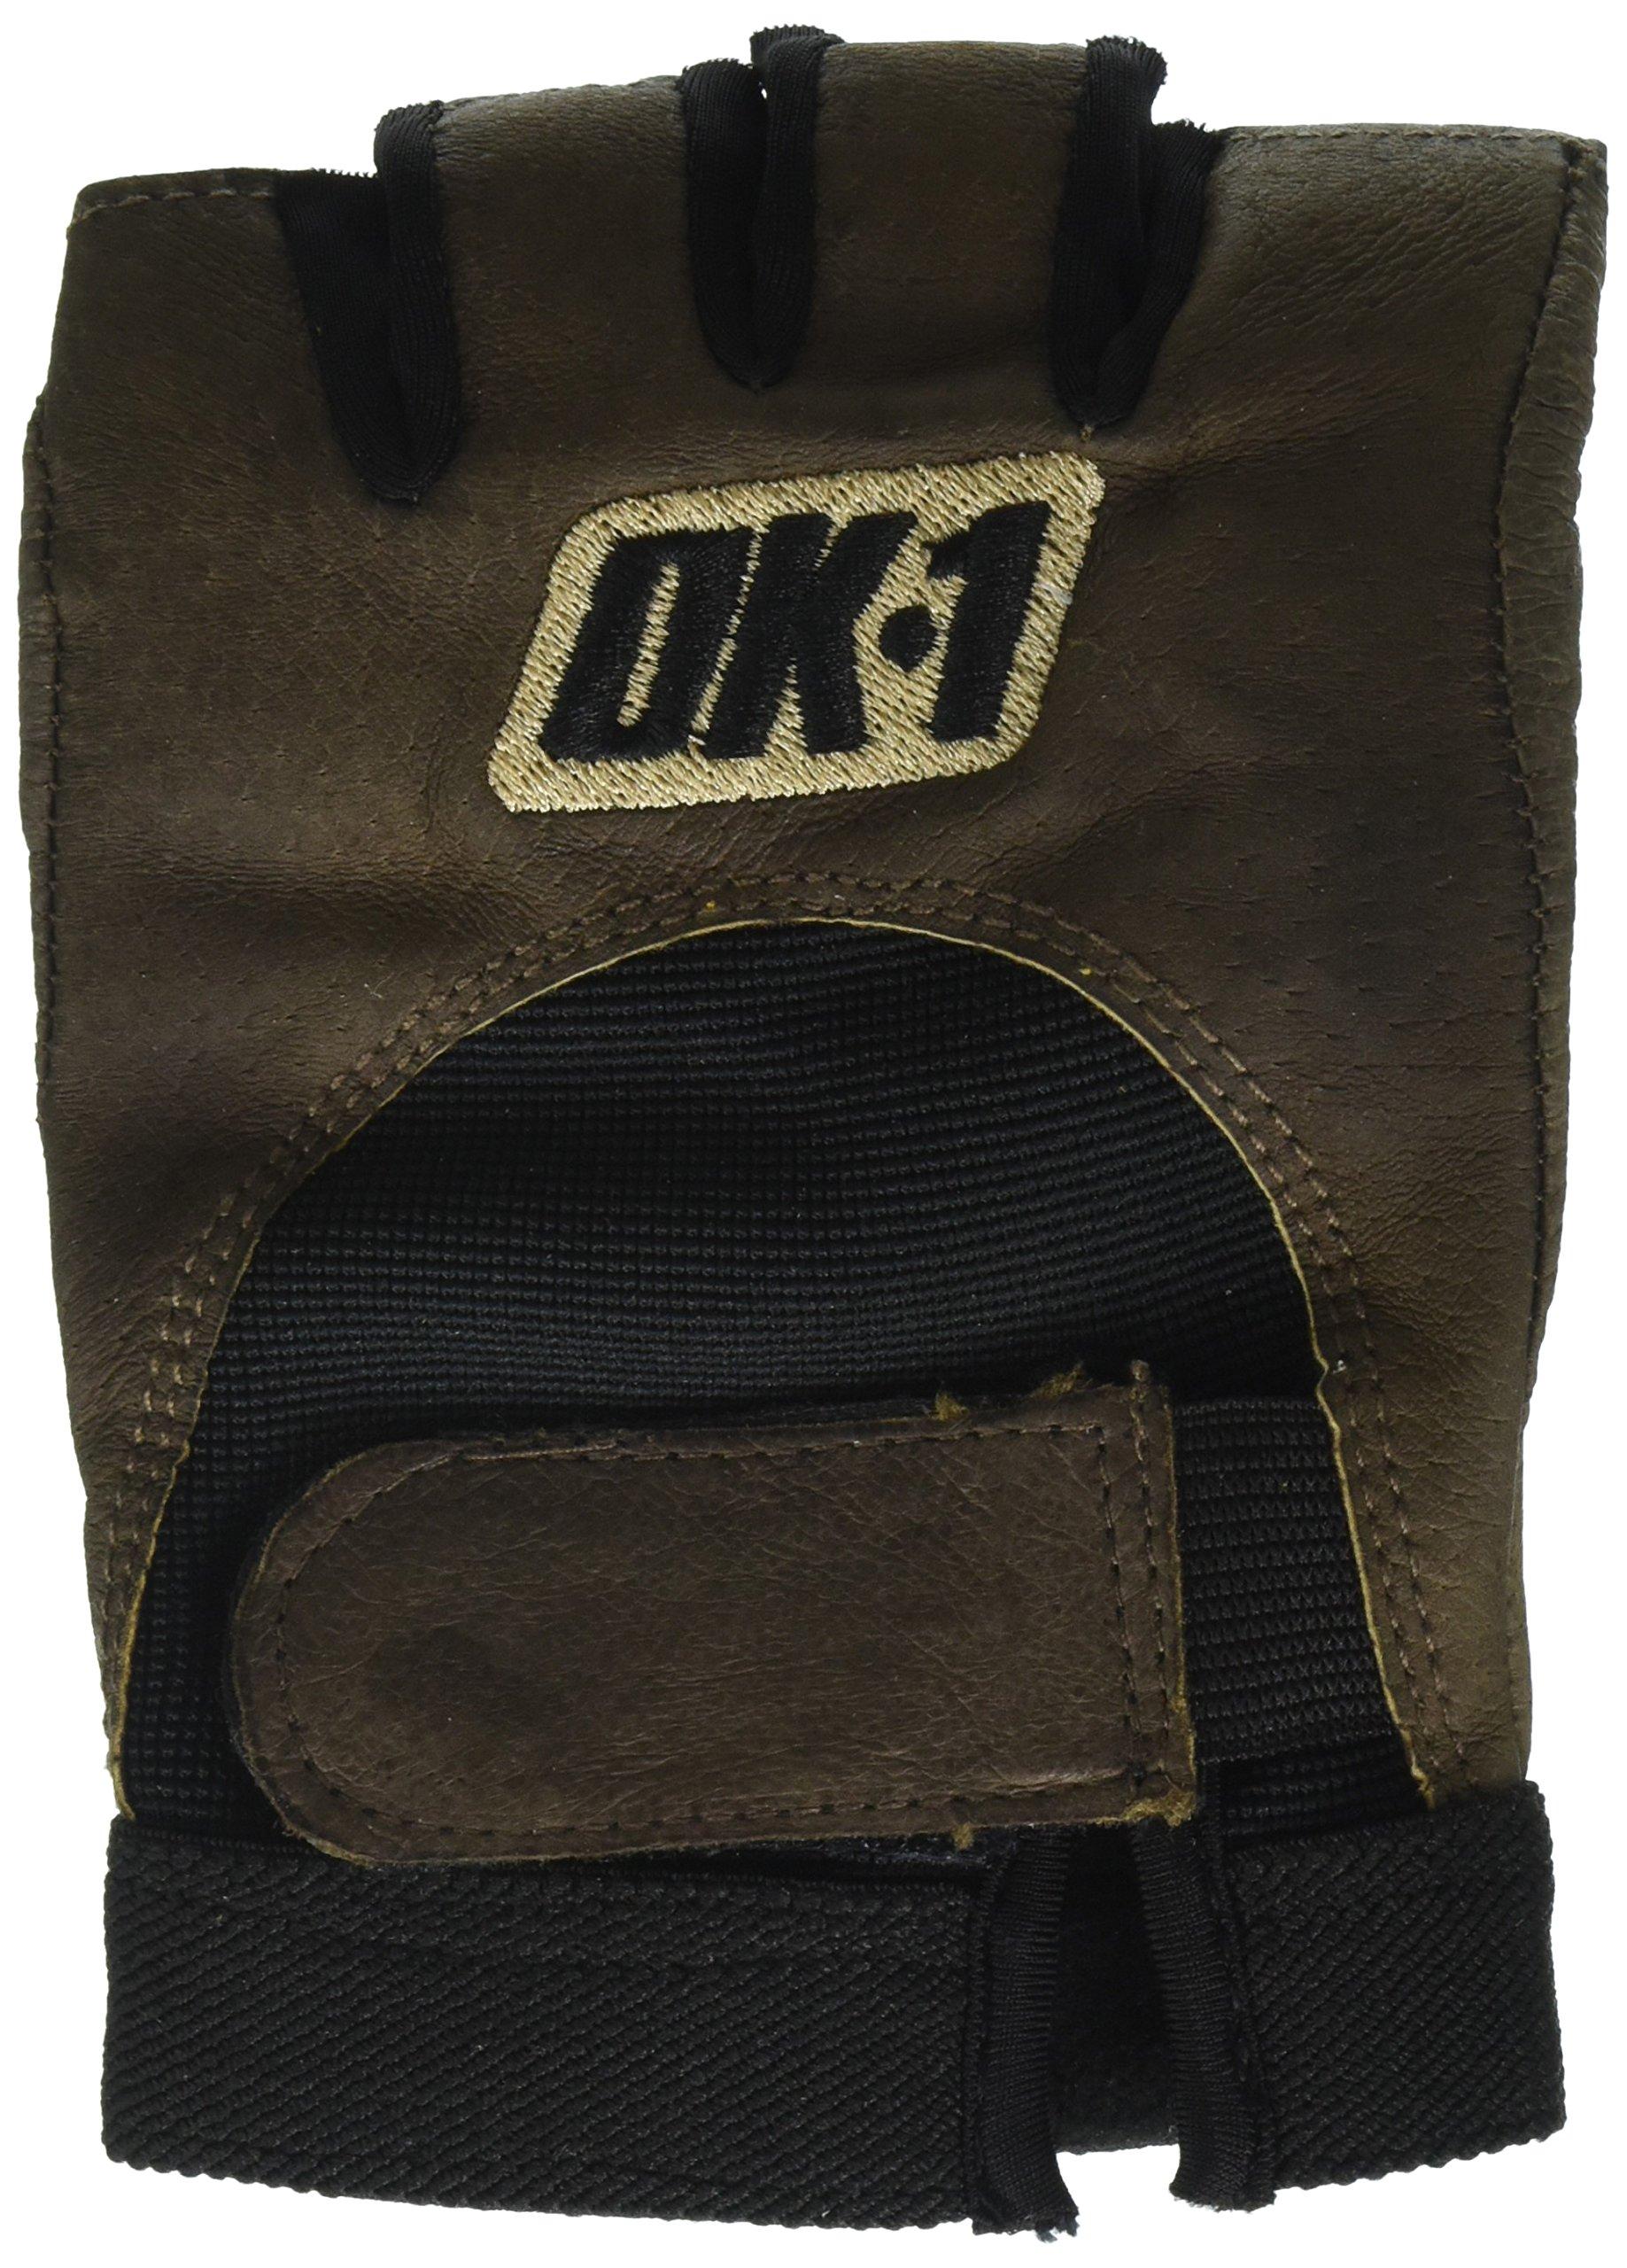 OK1 GLV1027M Half-Finger Impact Gloves, Medium, Brown (Case of 4)